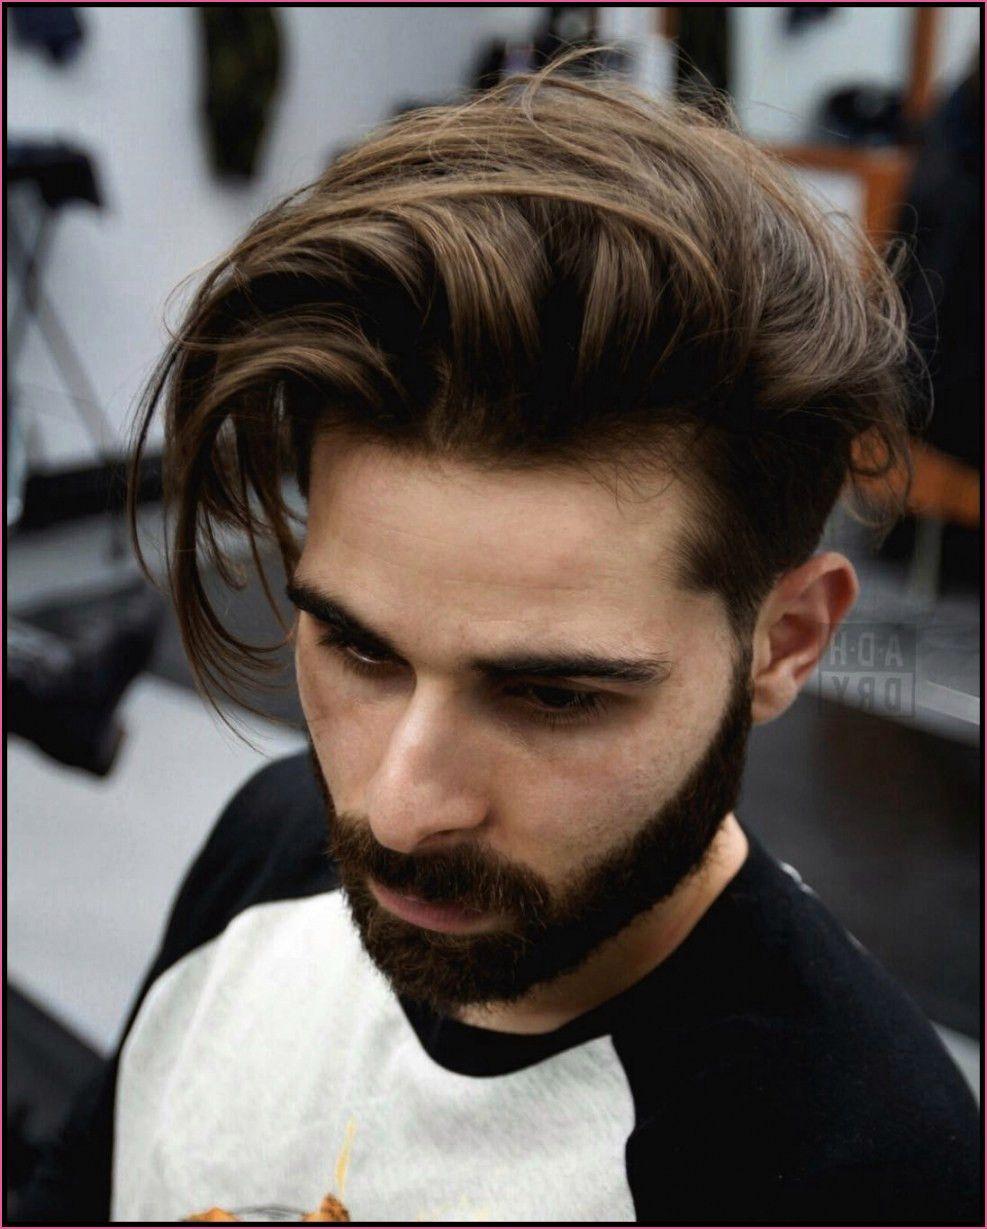 Deckhaar Lang Seiten Kurz Haare Manner Manner Frisuren Einfache Frisuren Mittellang